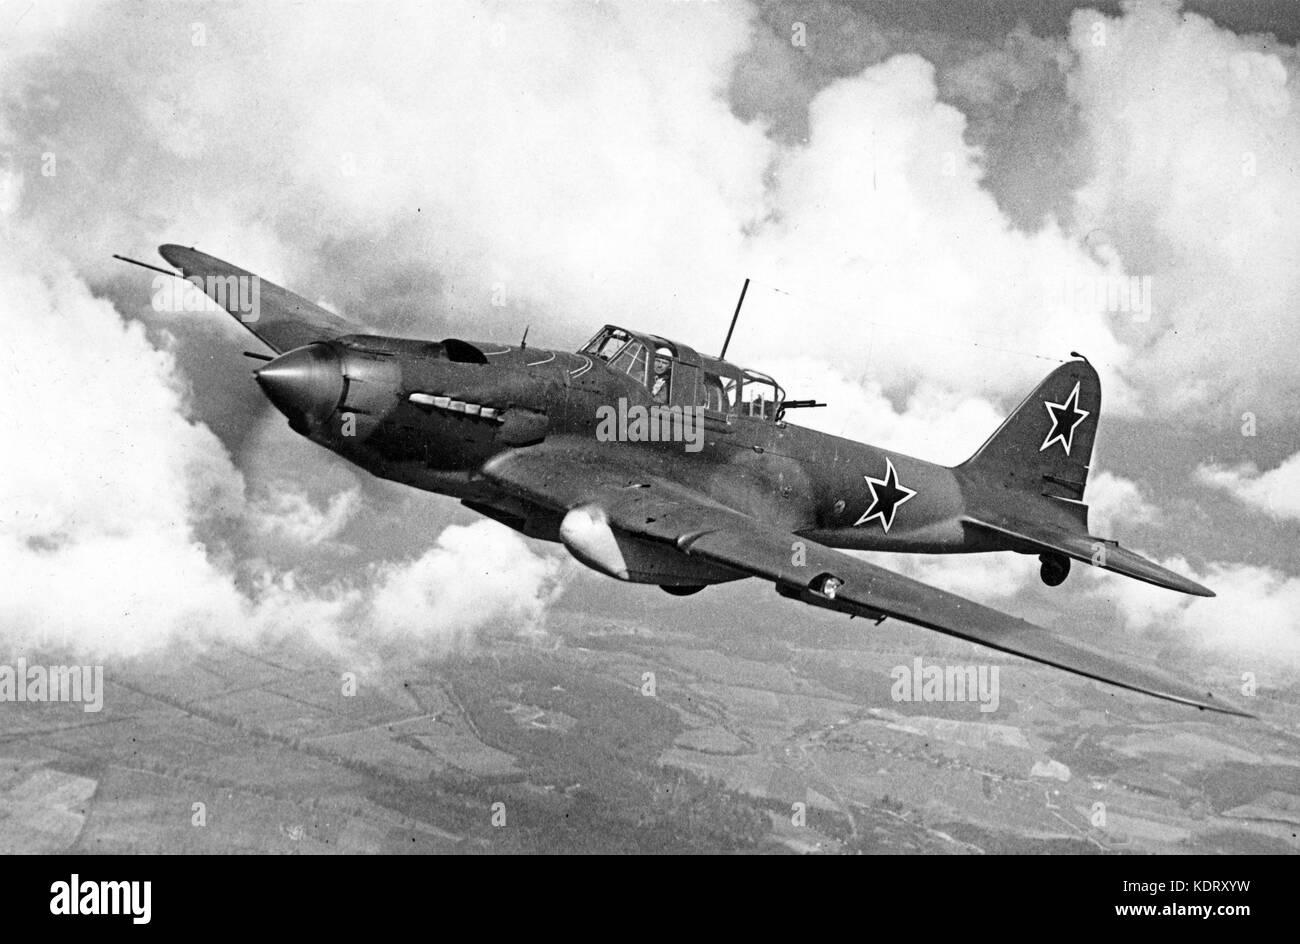 ILYUSHIN II-2 STURMOVIK Soviet airforce ground attack aircraft - Stock Image